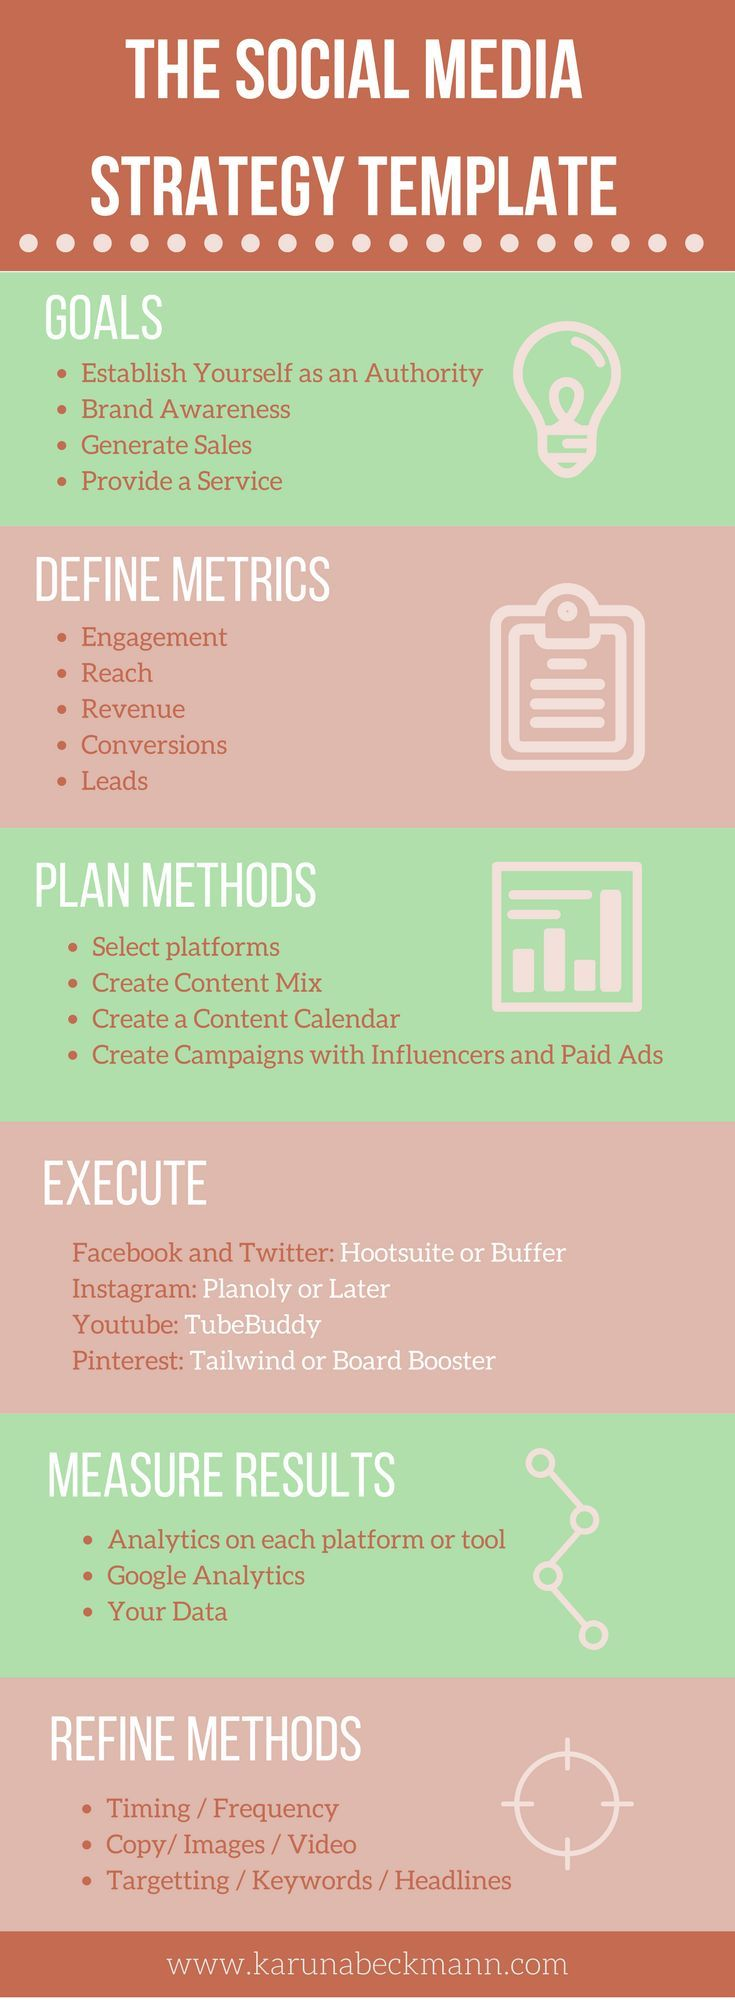 The Social Media Strategy Template Karuna Beckmann Marketing Vancouver Social Media Management Seo In 2020 Digitales Marketing Soziale Medien Soziale Netzwerke